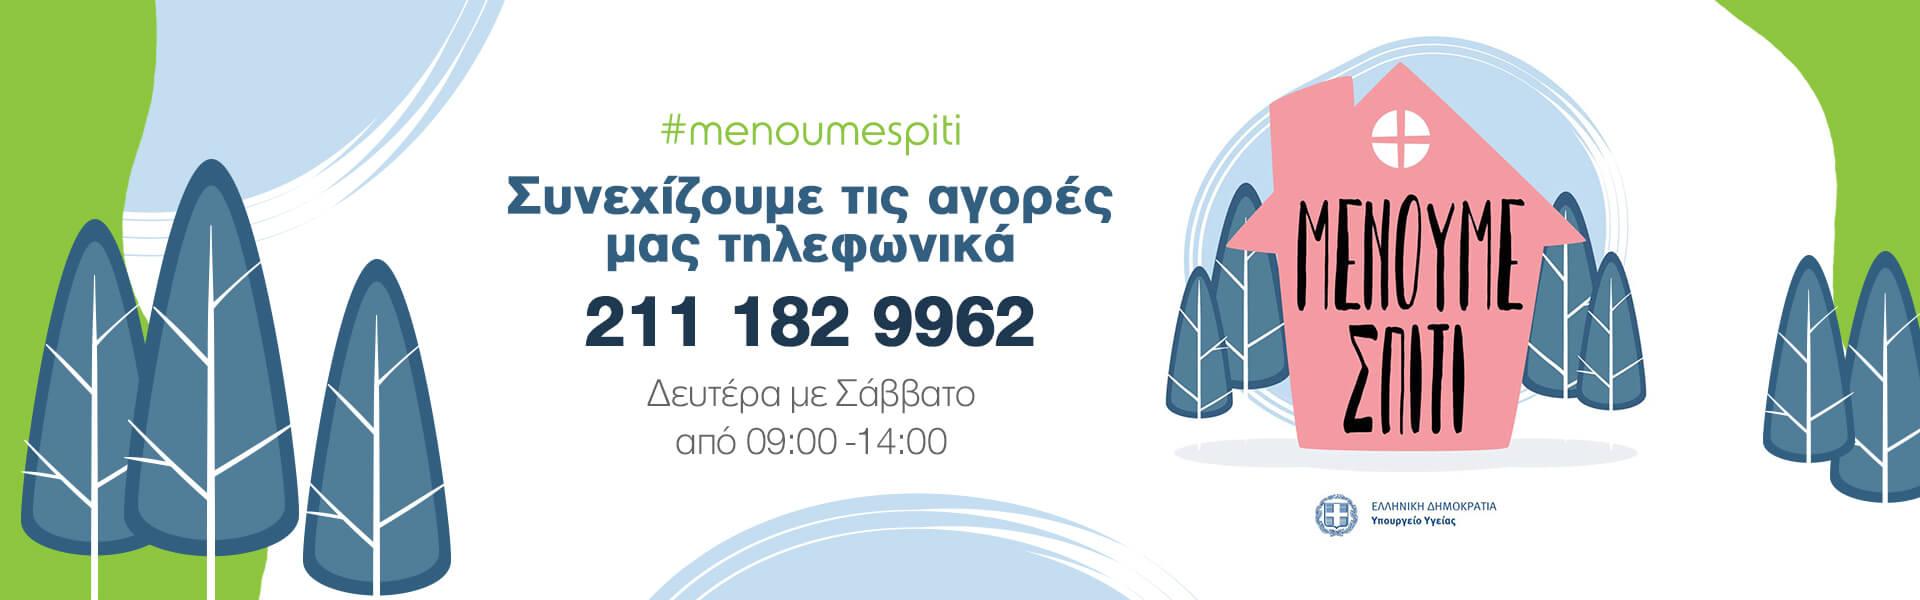 GAIA_SLIDER_MENOUME_SPITI